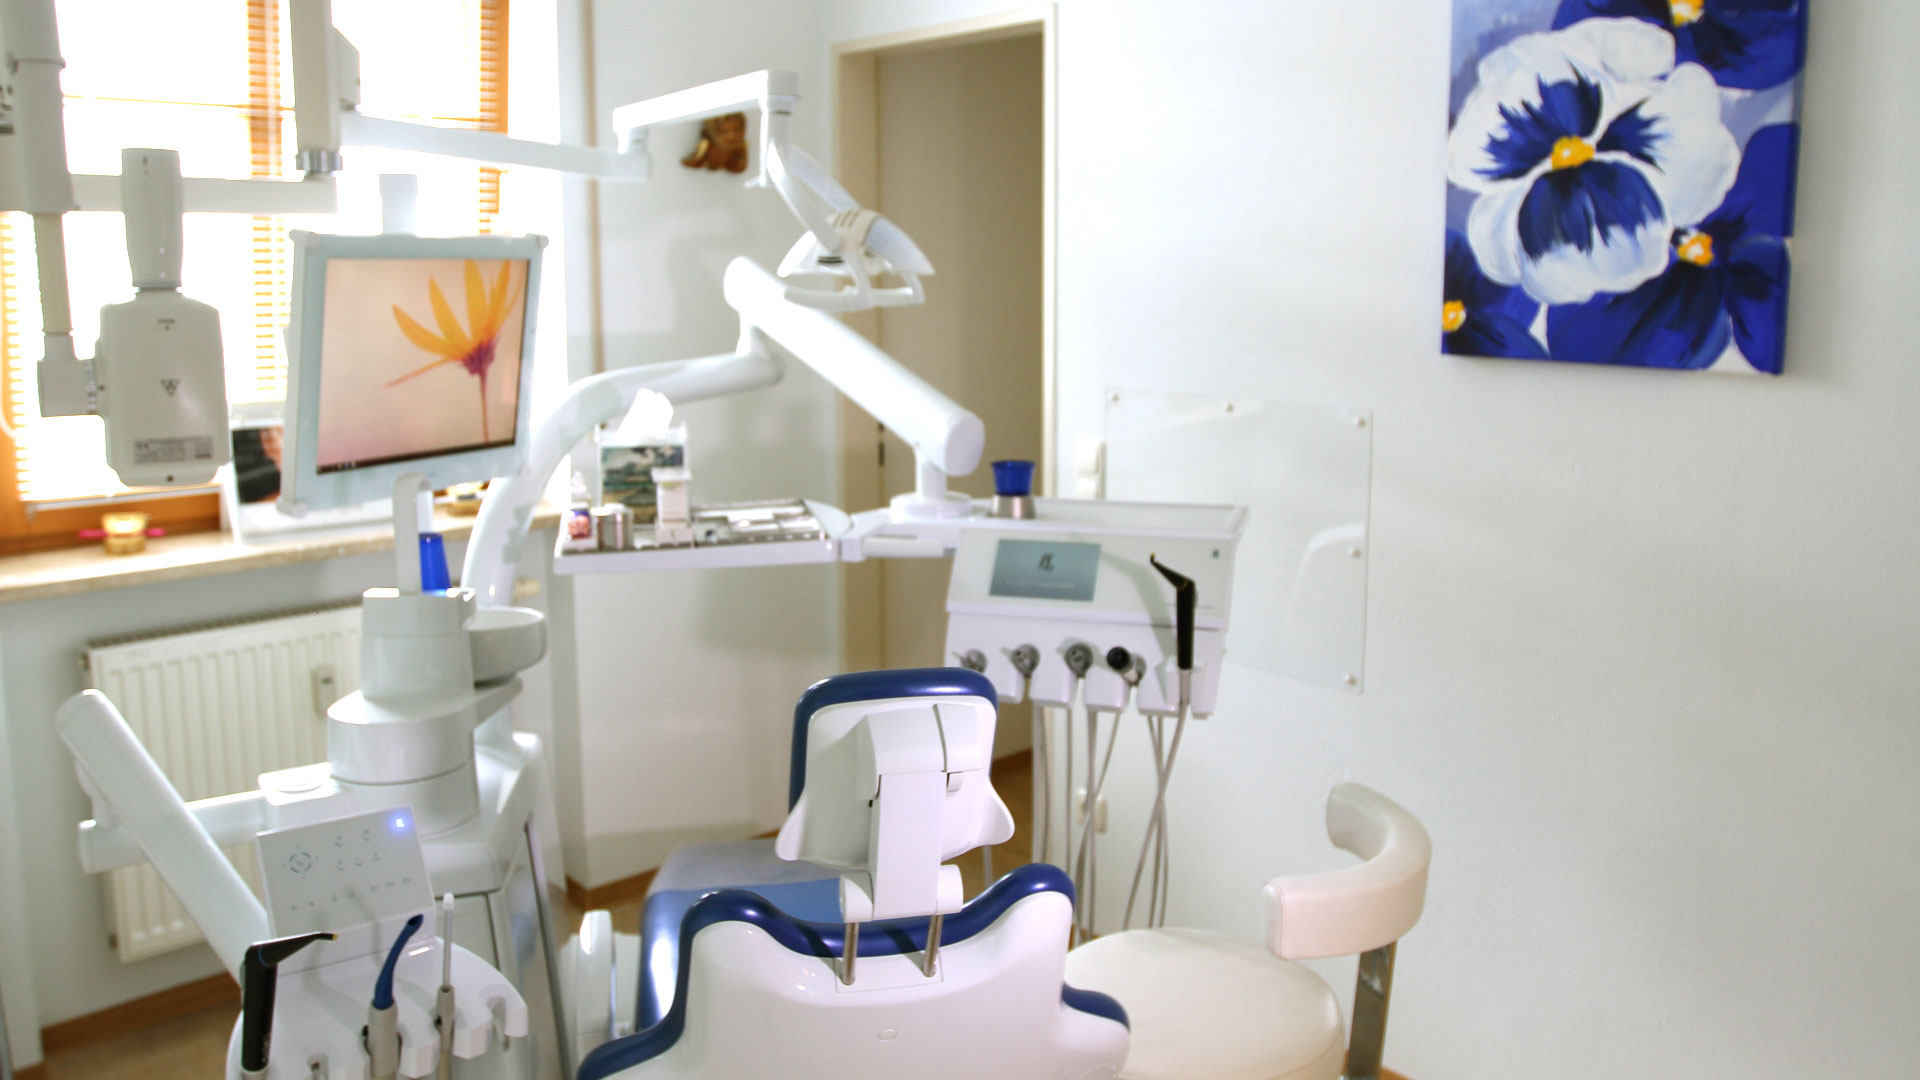 Zahnarztpraxis Sylvia Pahl Behandlungsstuhl Blau